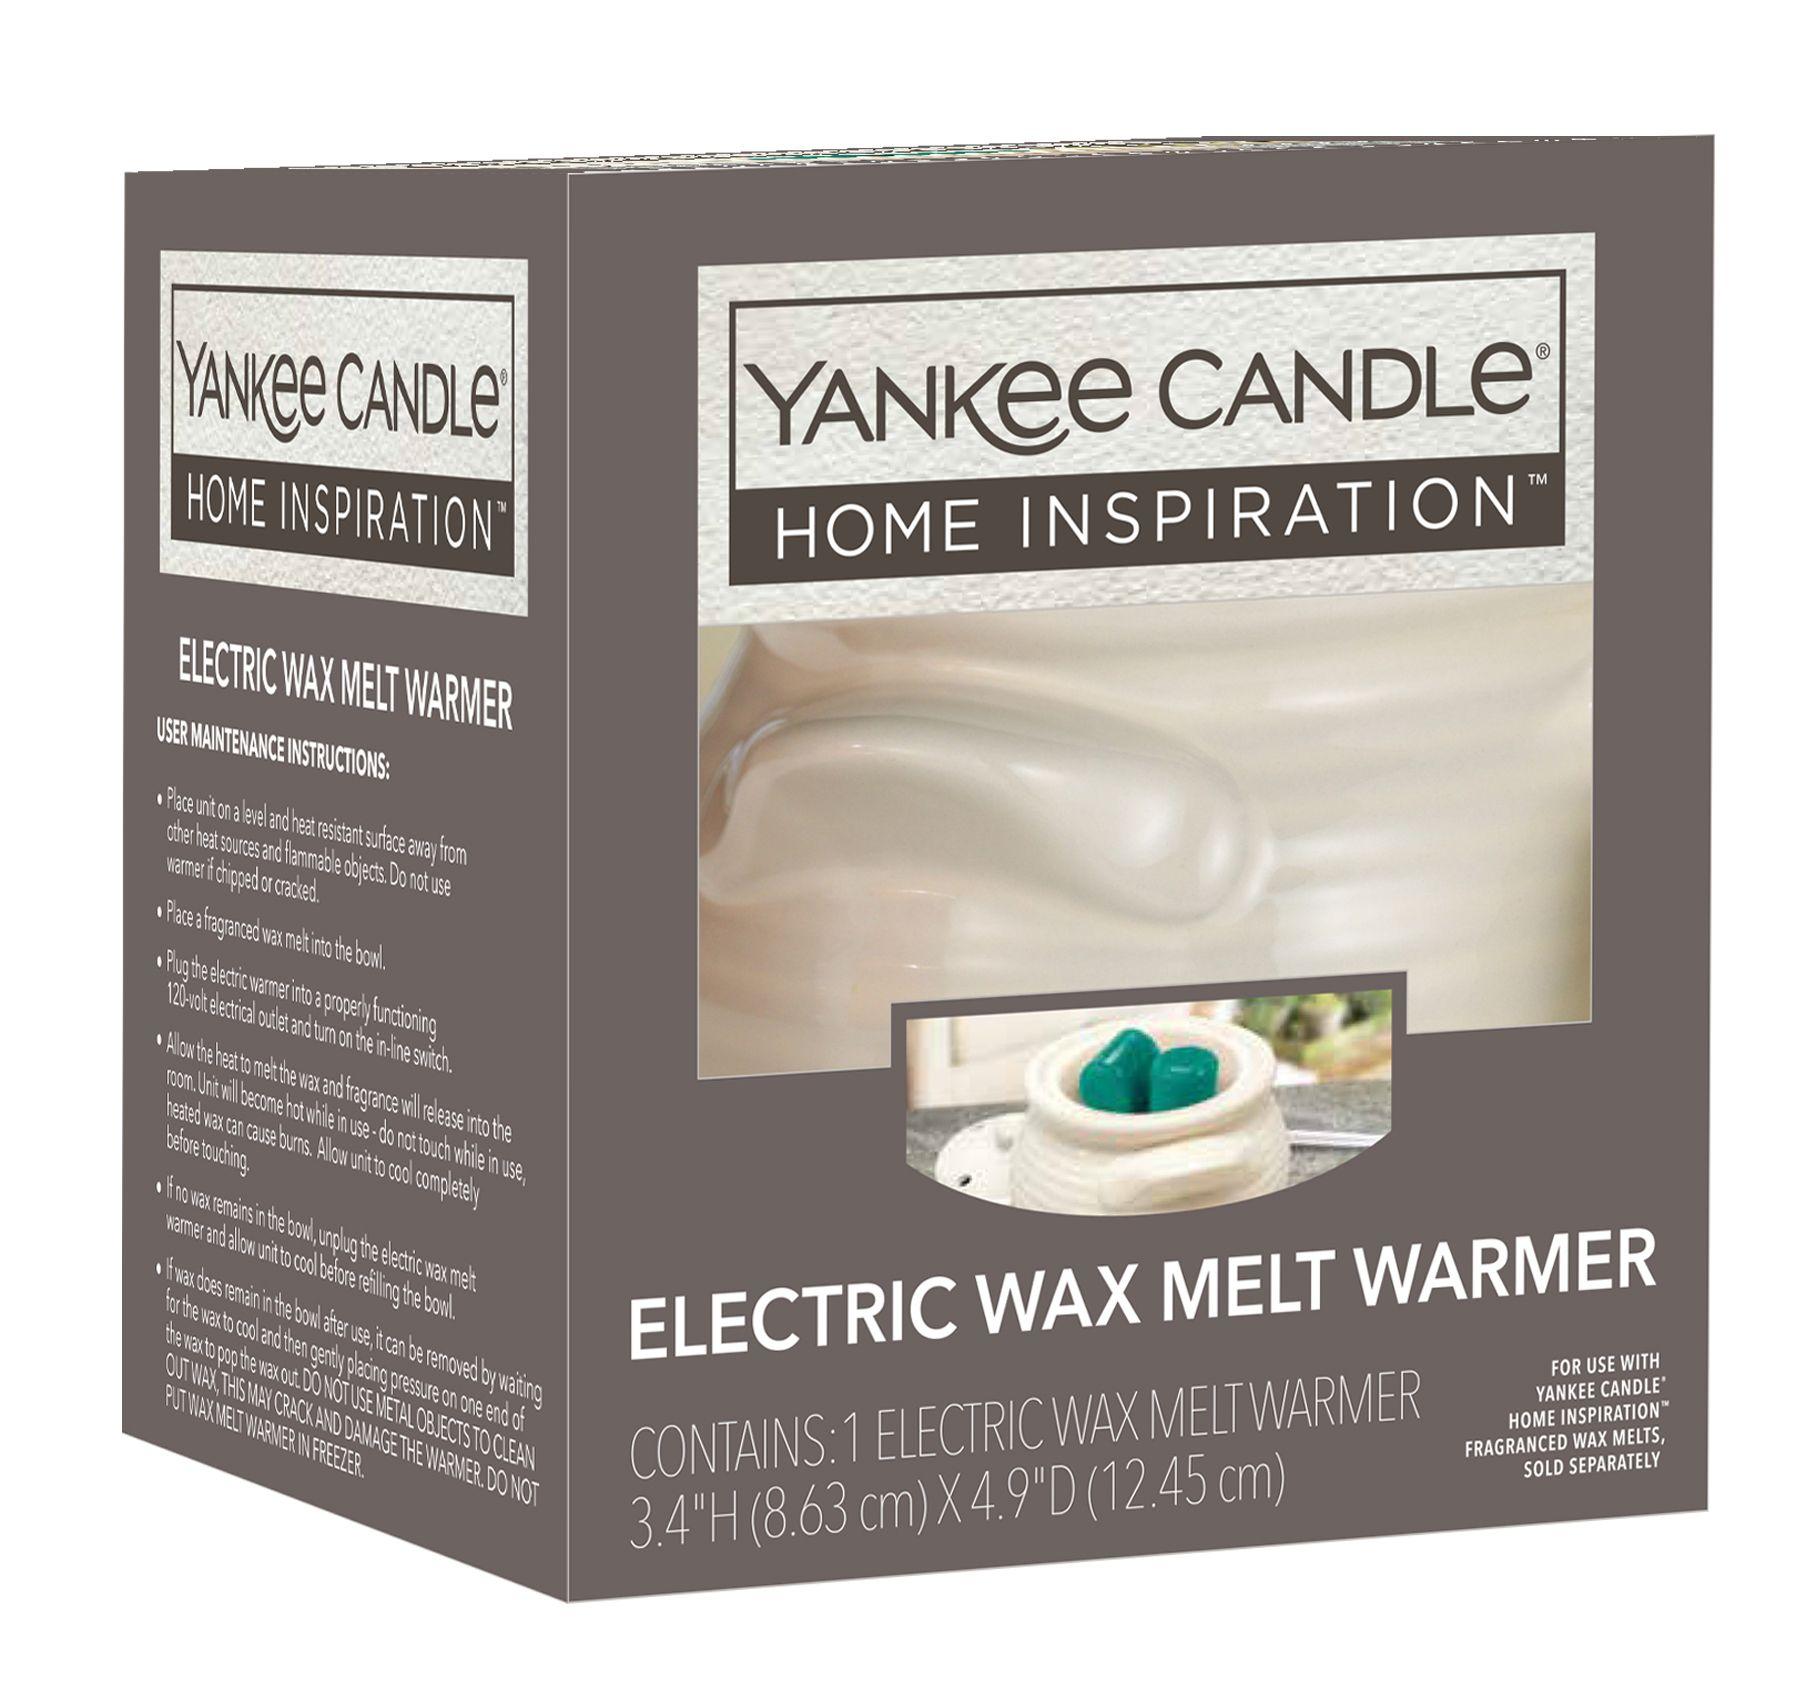 Yankee Candle Electric Wax Melt Warmer Bjs Wholesale Club